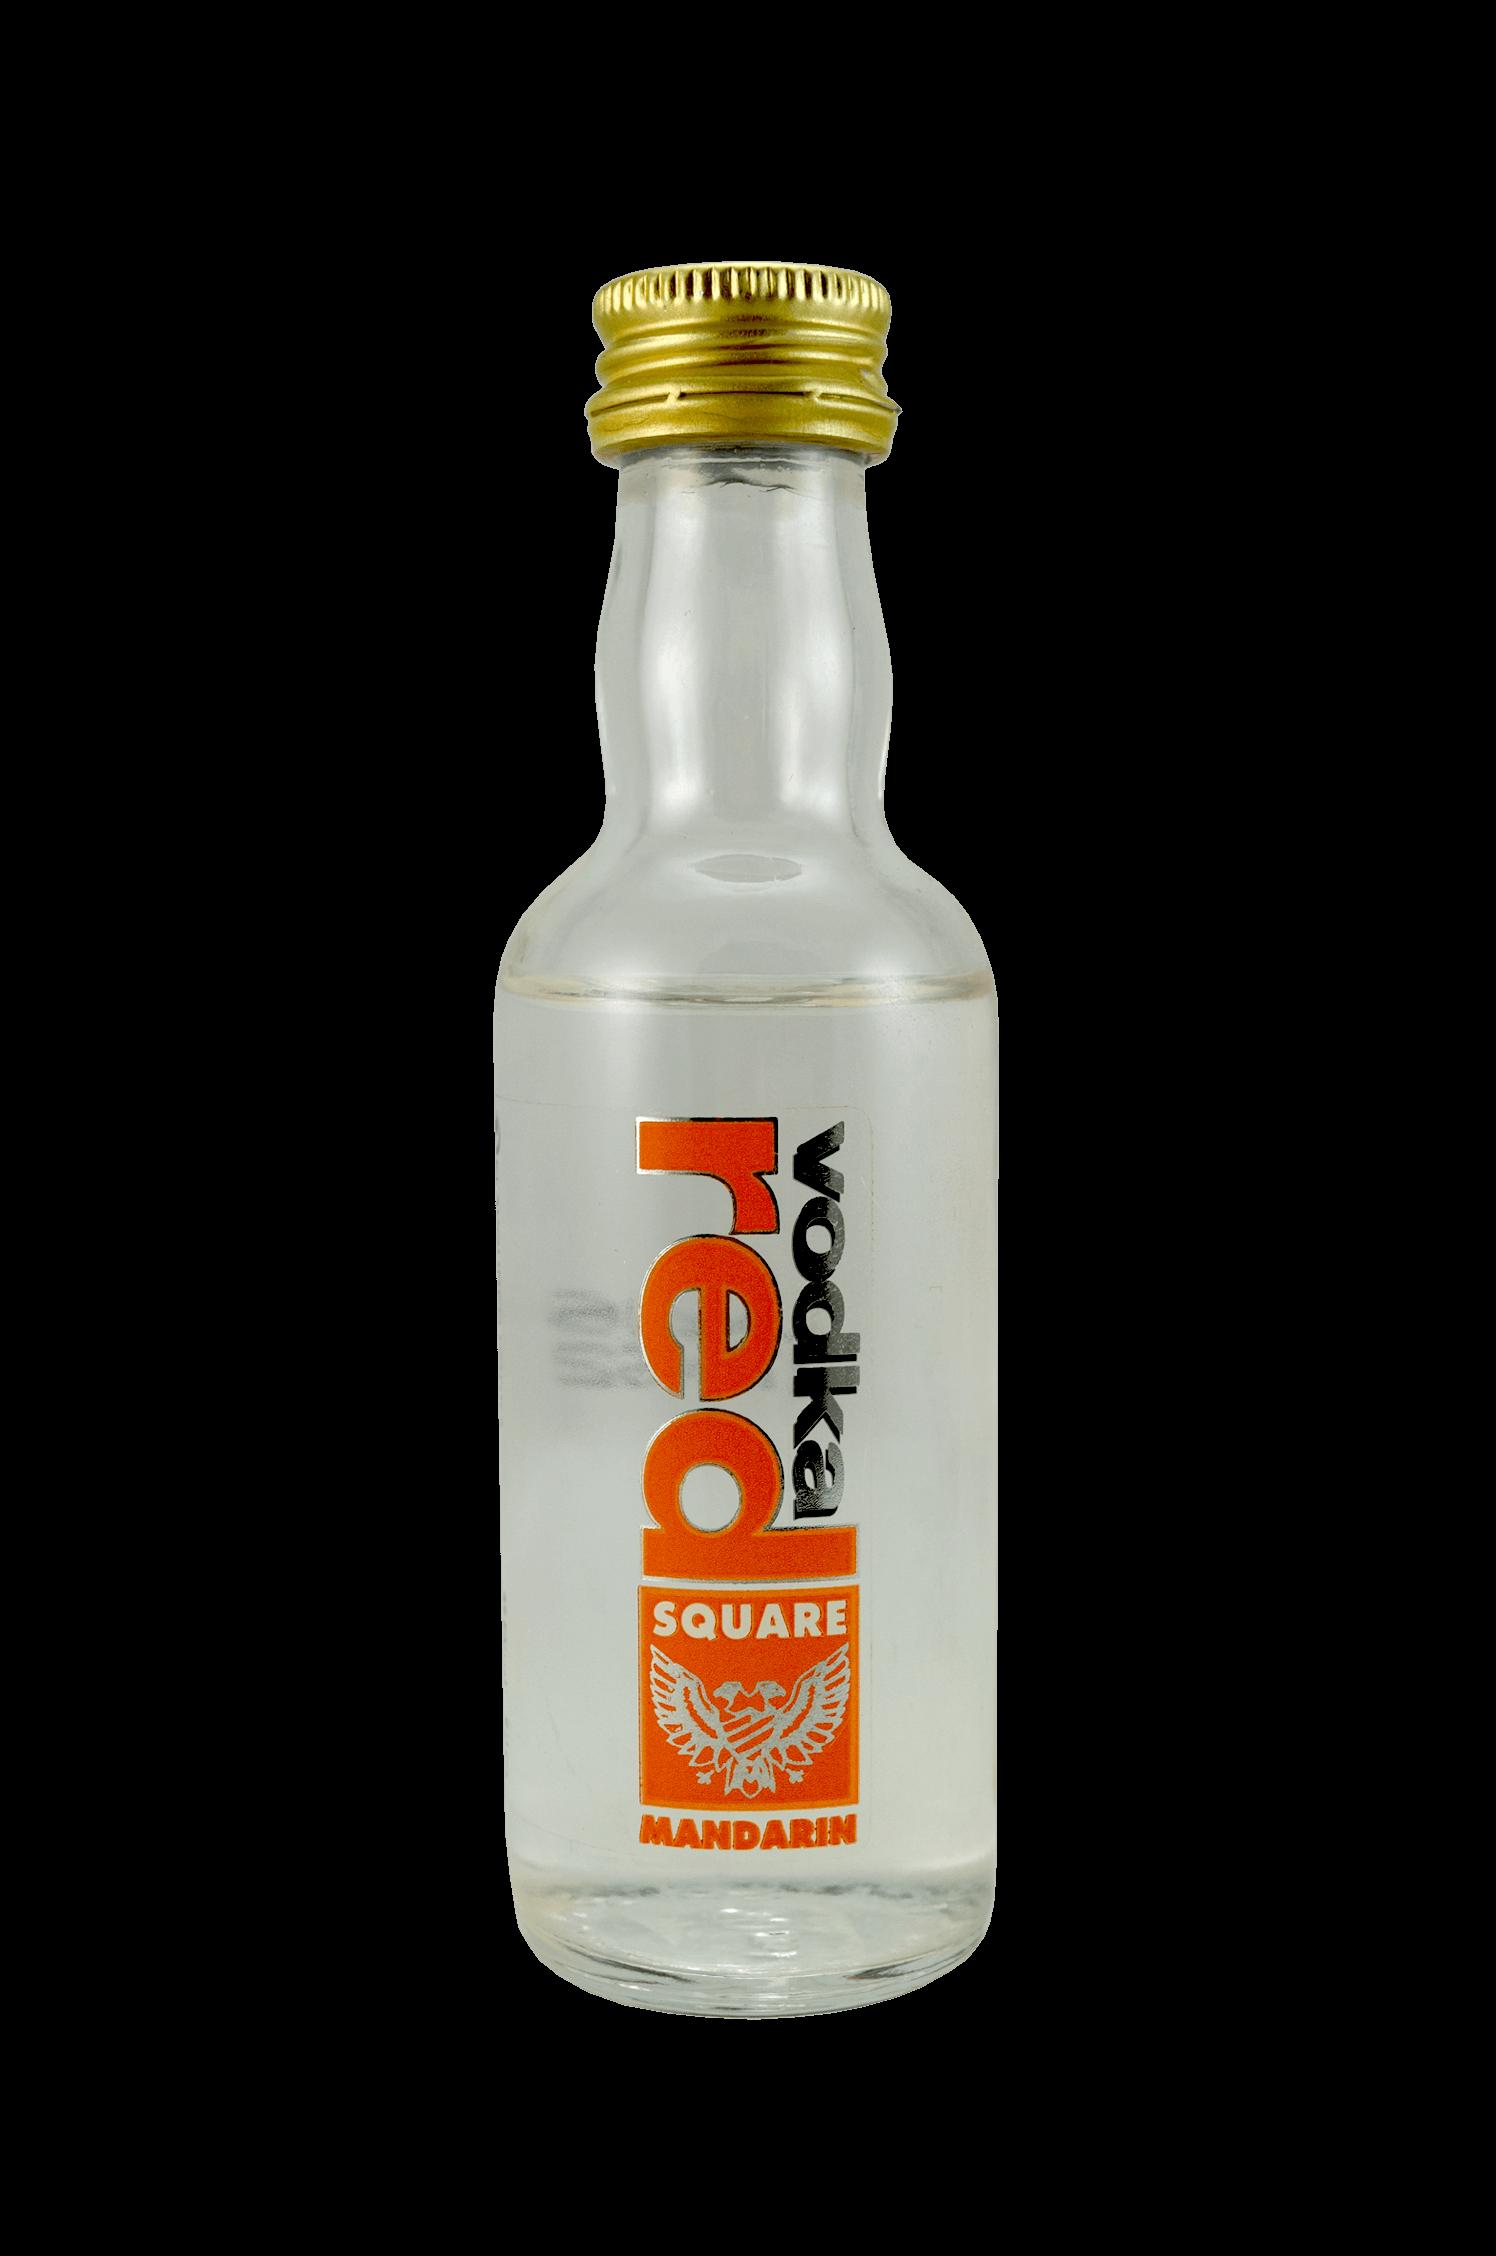 Vodka Red Square Mandarin